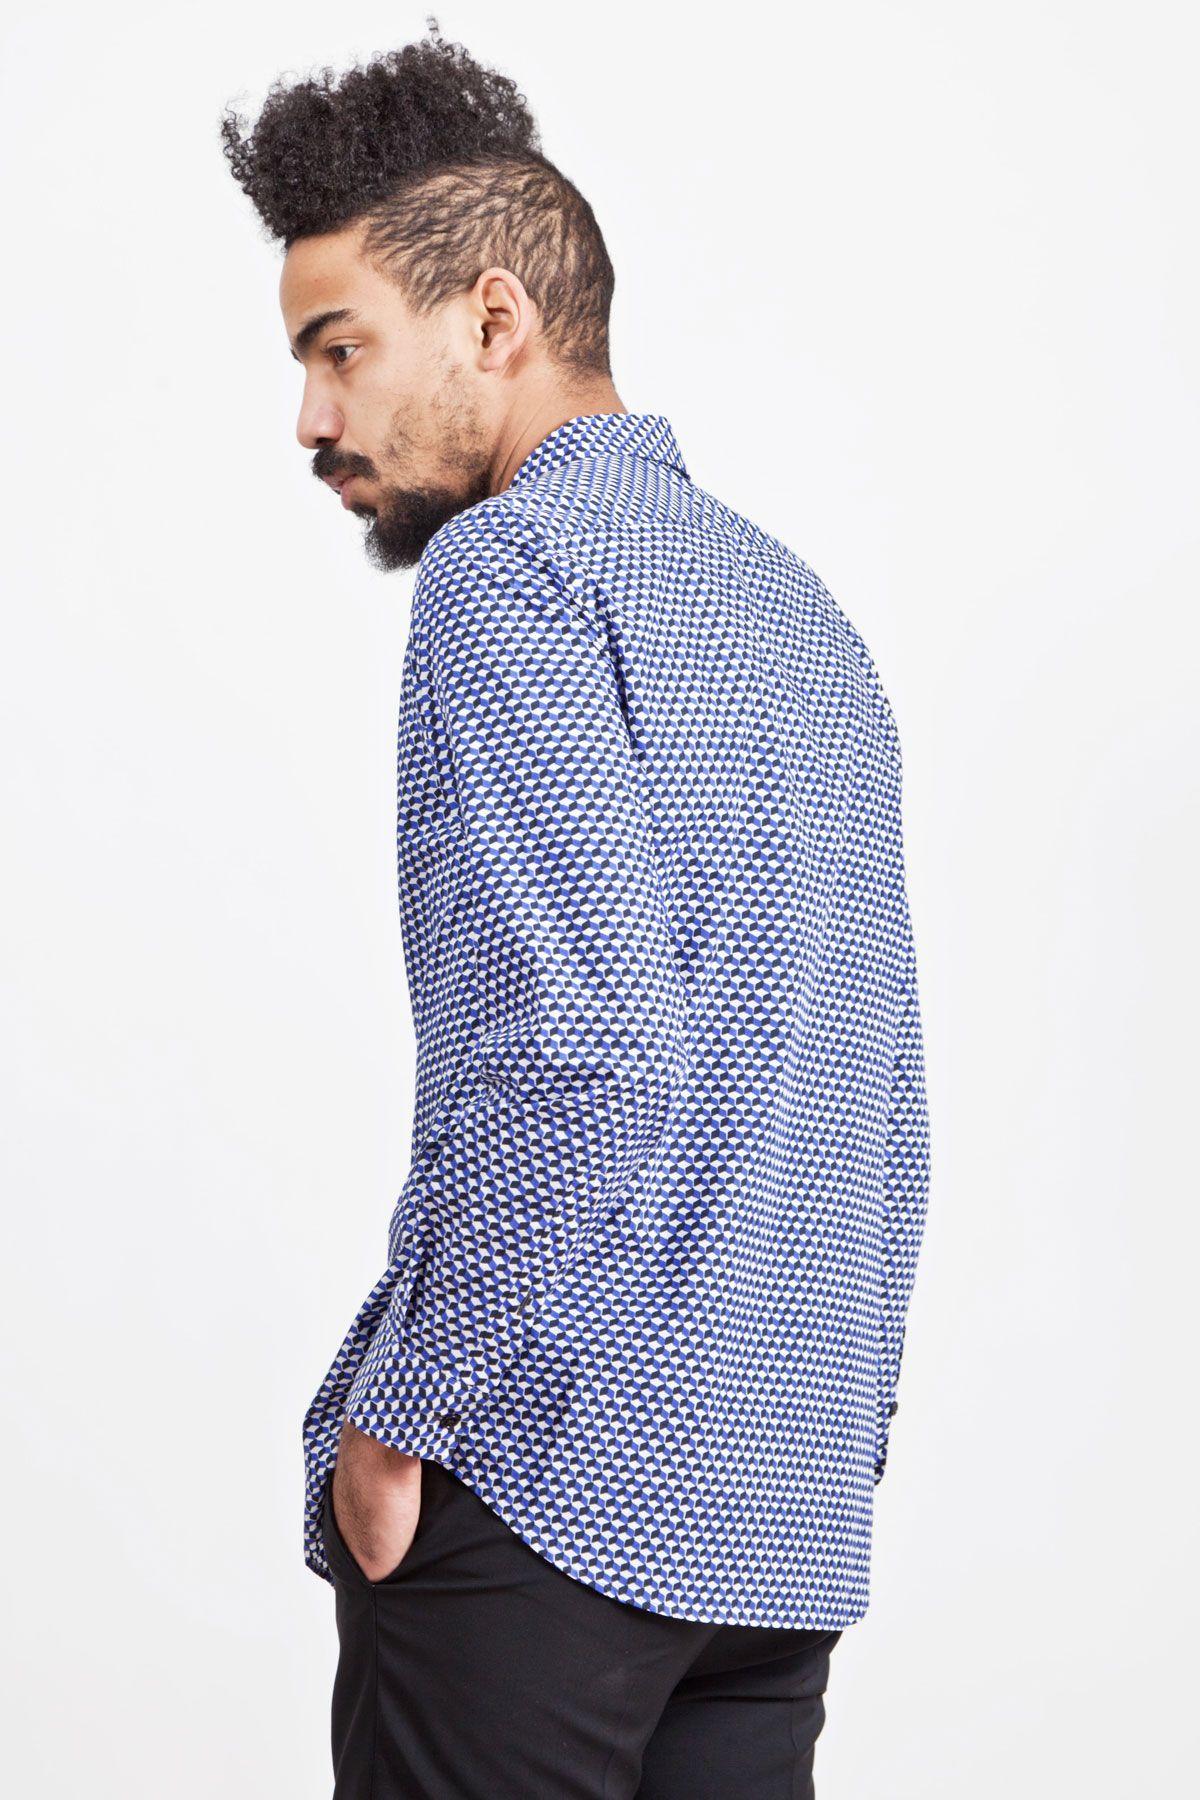 Marni - Geometric Print Shirt Blue | TRÈS BIEN SHOP